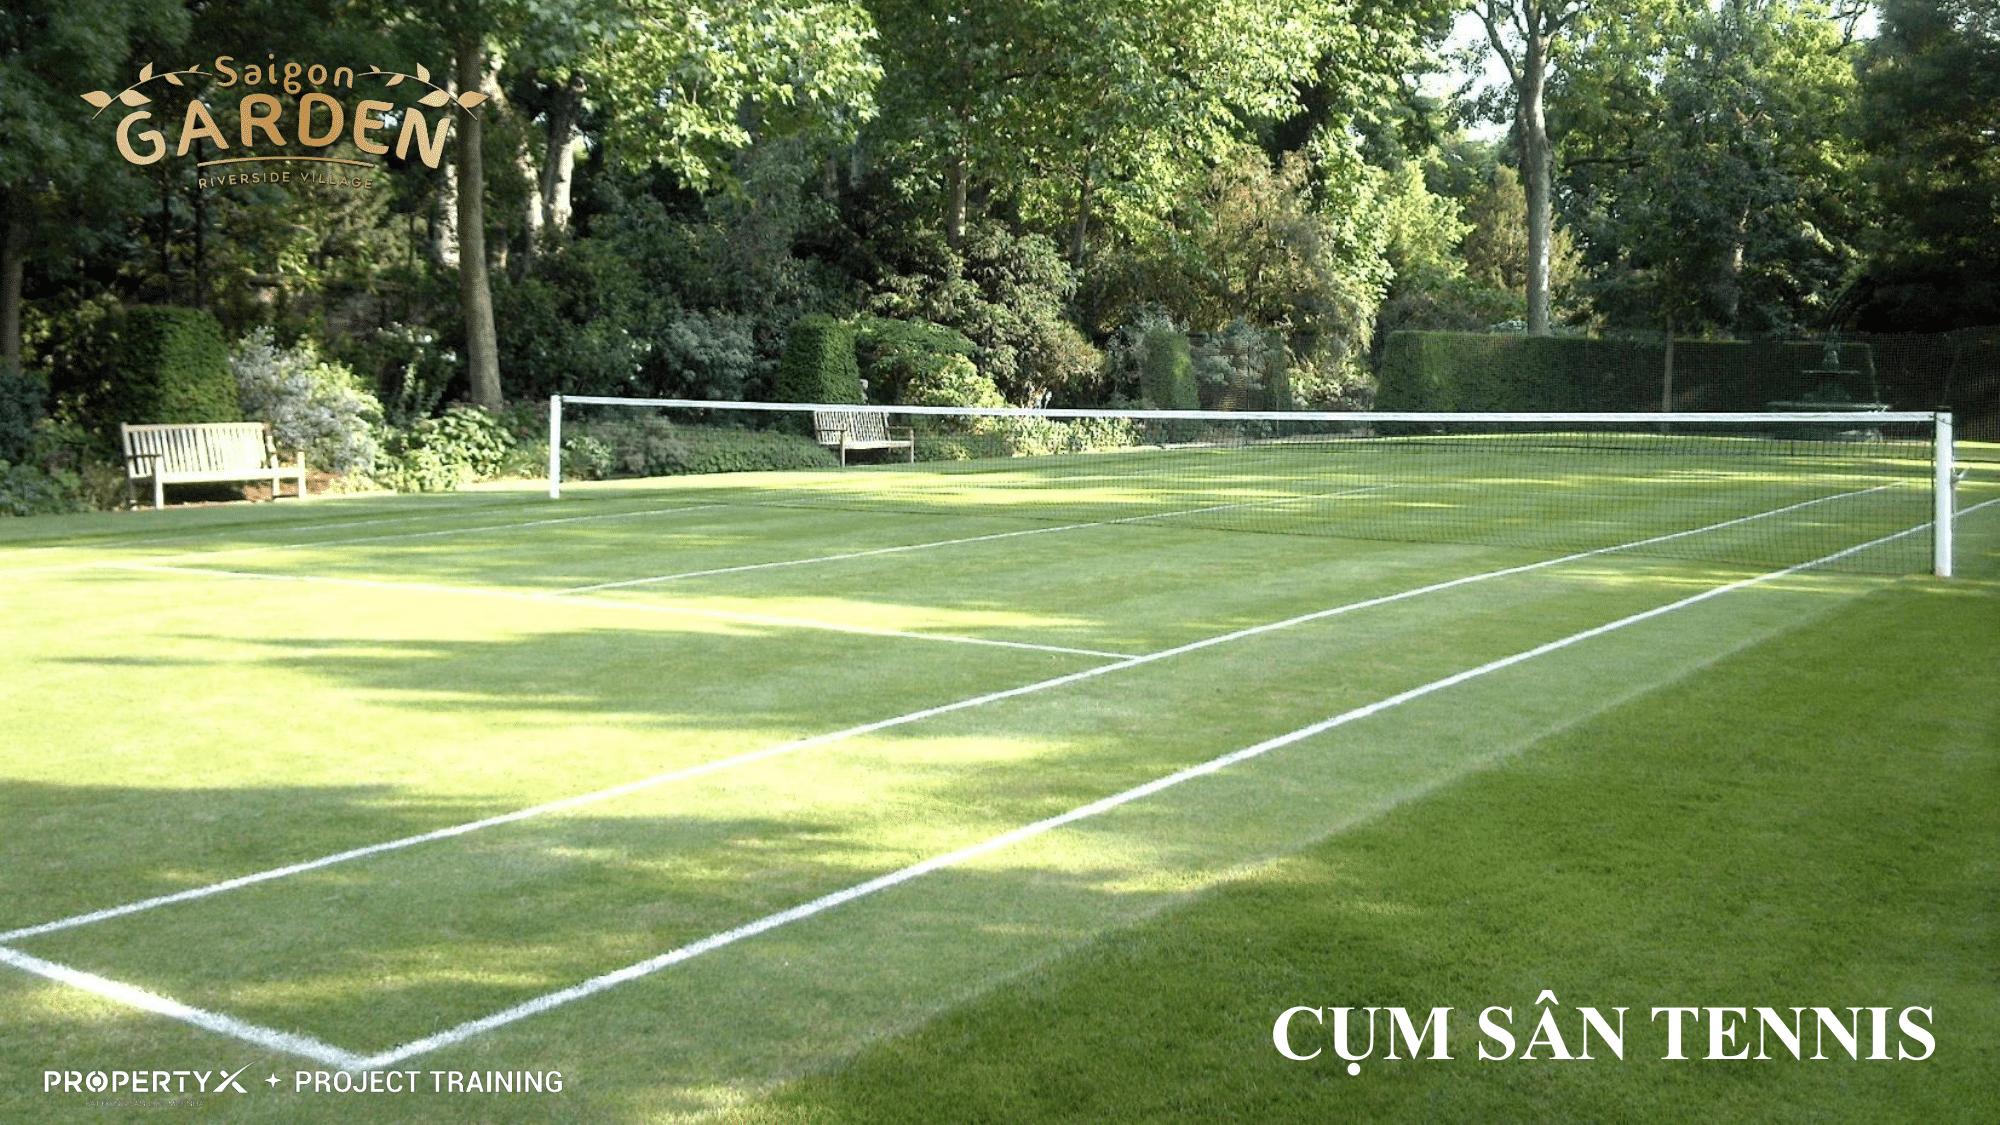 Cụm sân tennis tại dự án Saigon Garden Riverside Village